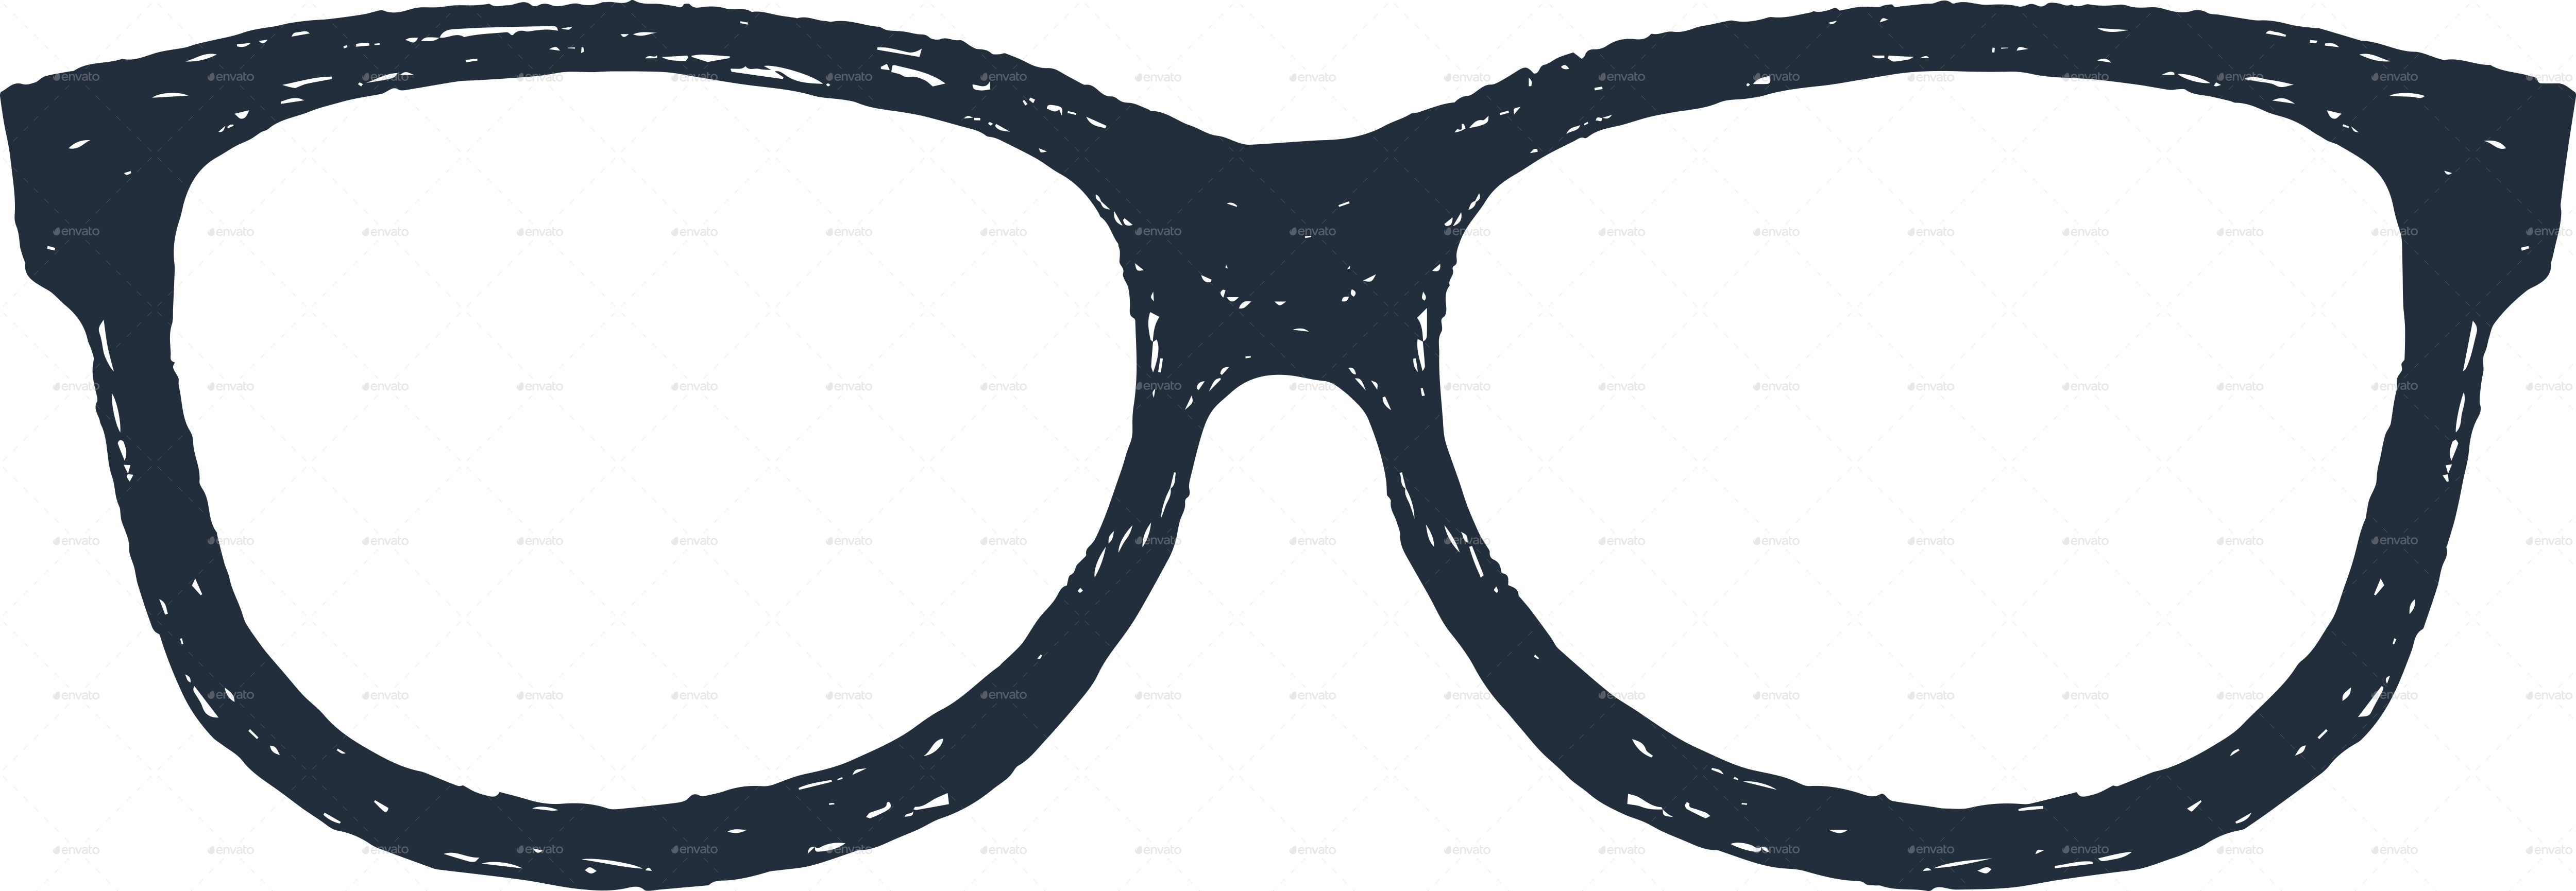 Sunglasses clipart horn rimmed glass. Hipster glasses transparent png